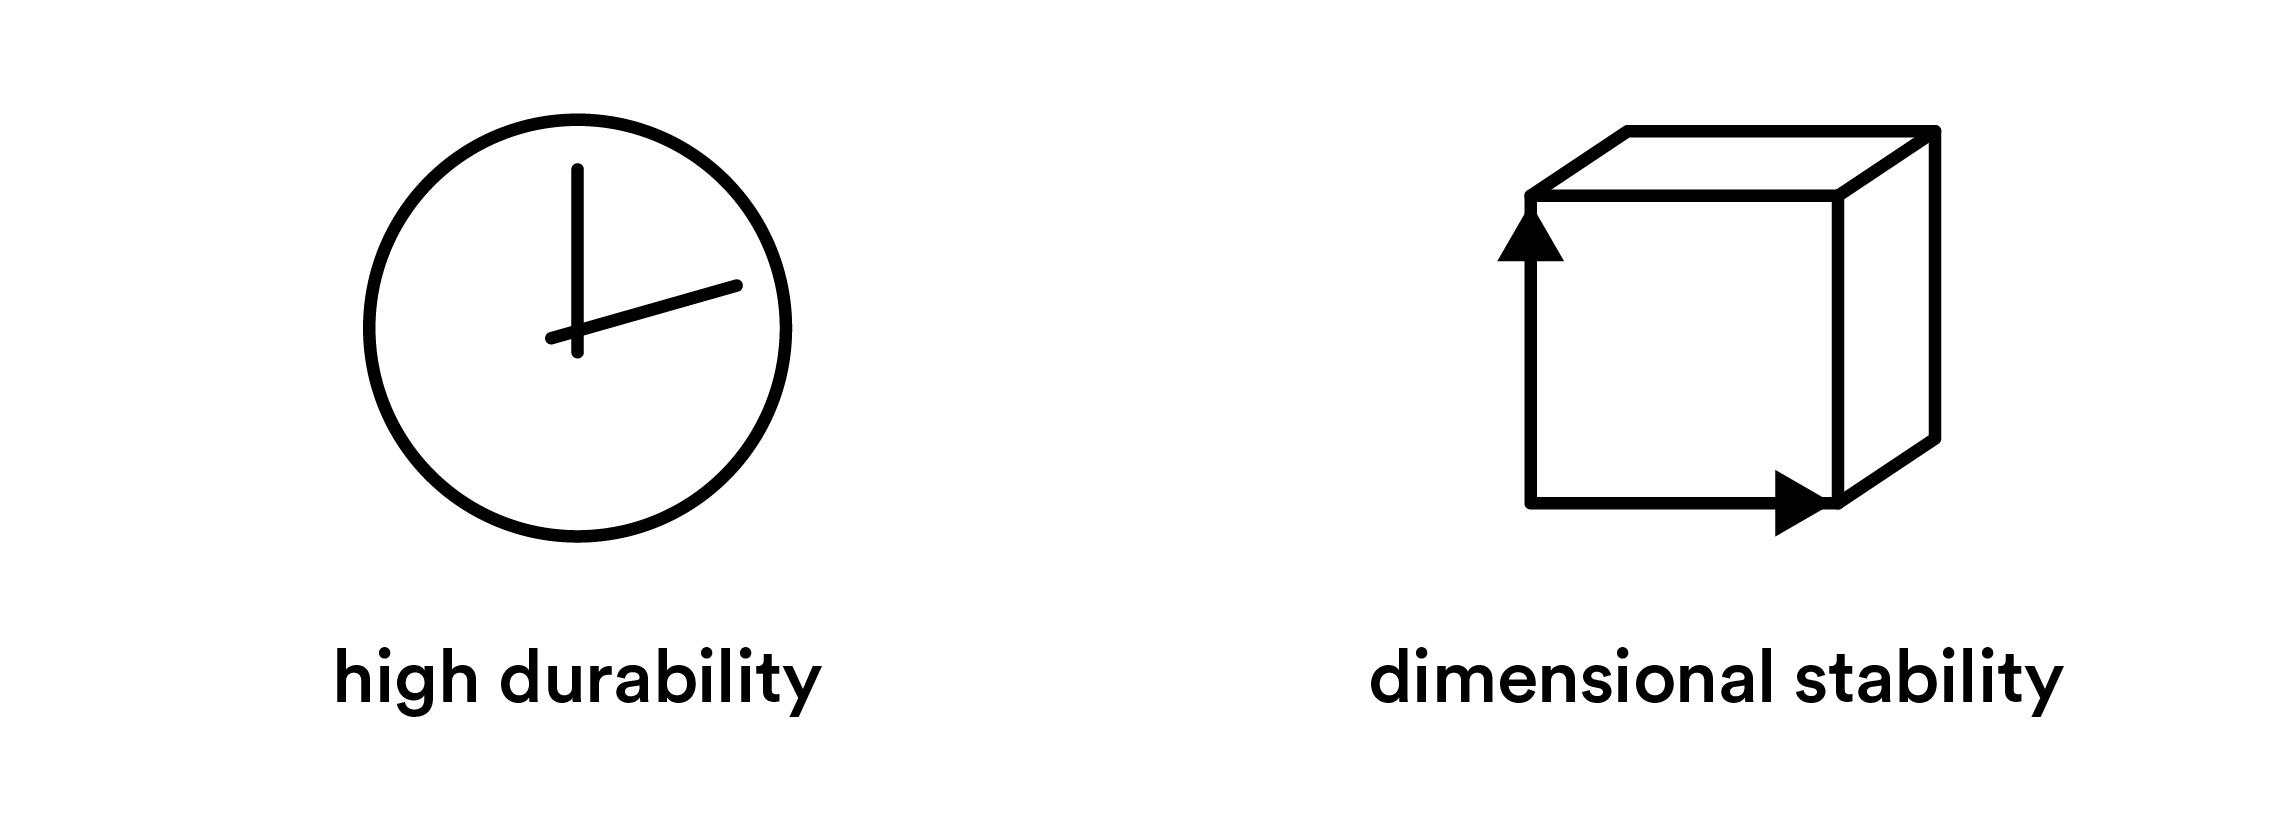 High durability, dimensional stability.